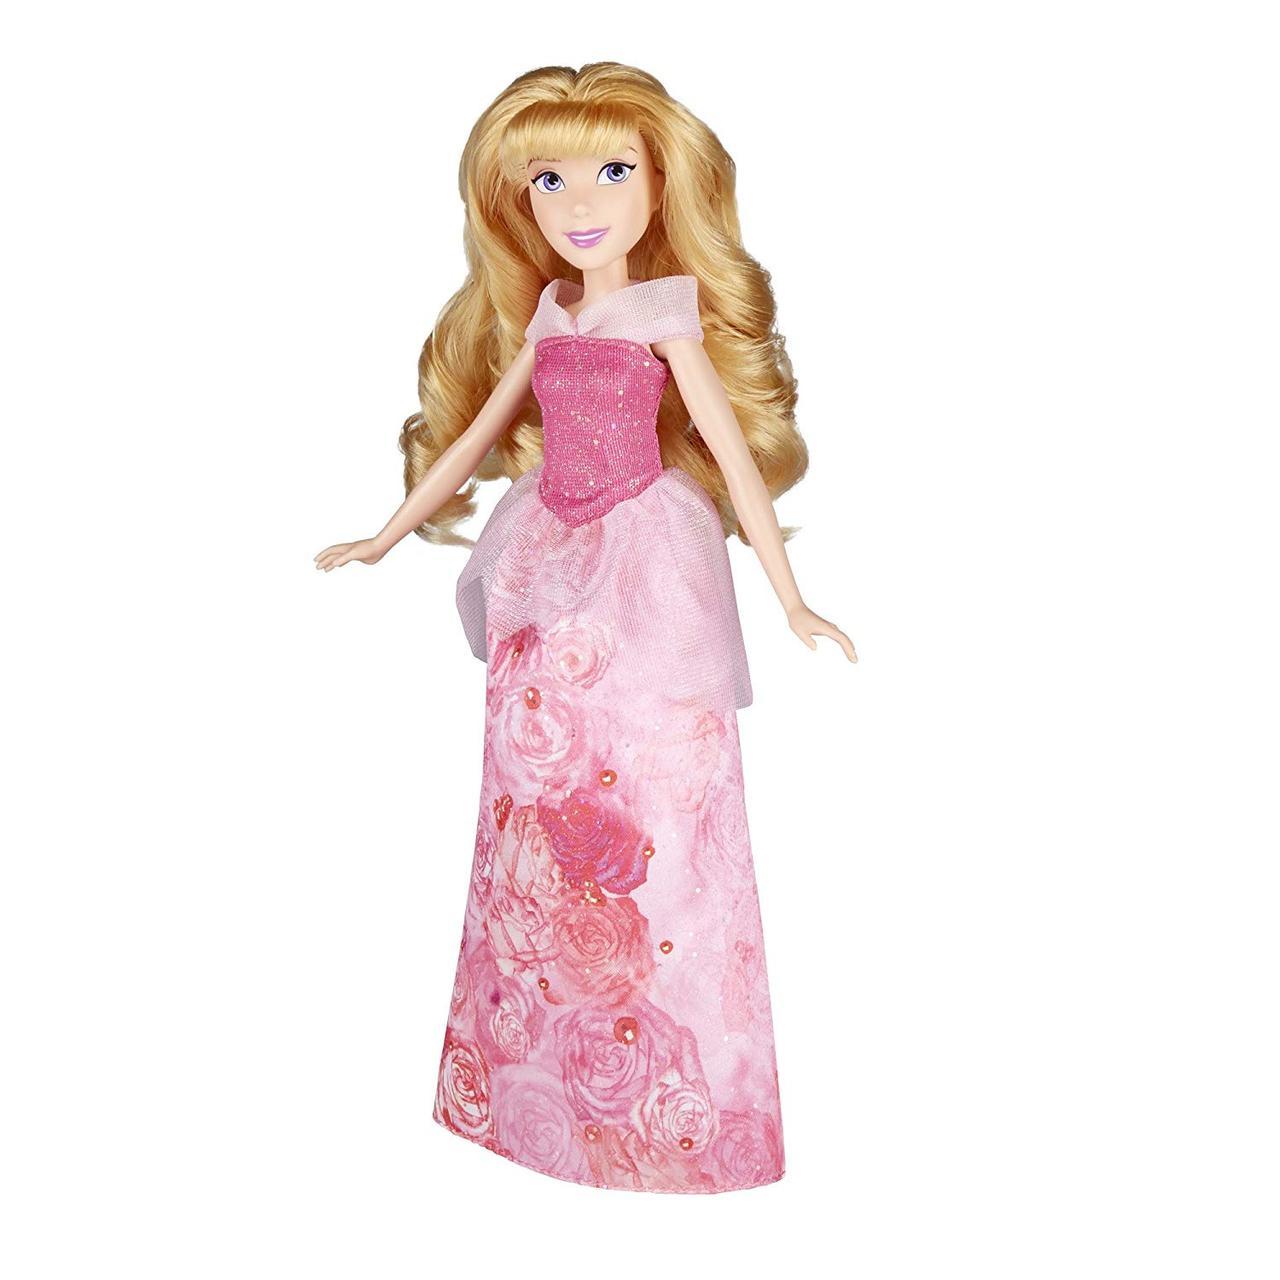 Принцесса Диснея кукла Аврора Оригинал Disney Princess Royal Shimmer Aurora Doll (E0278)